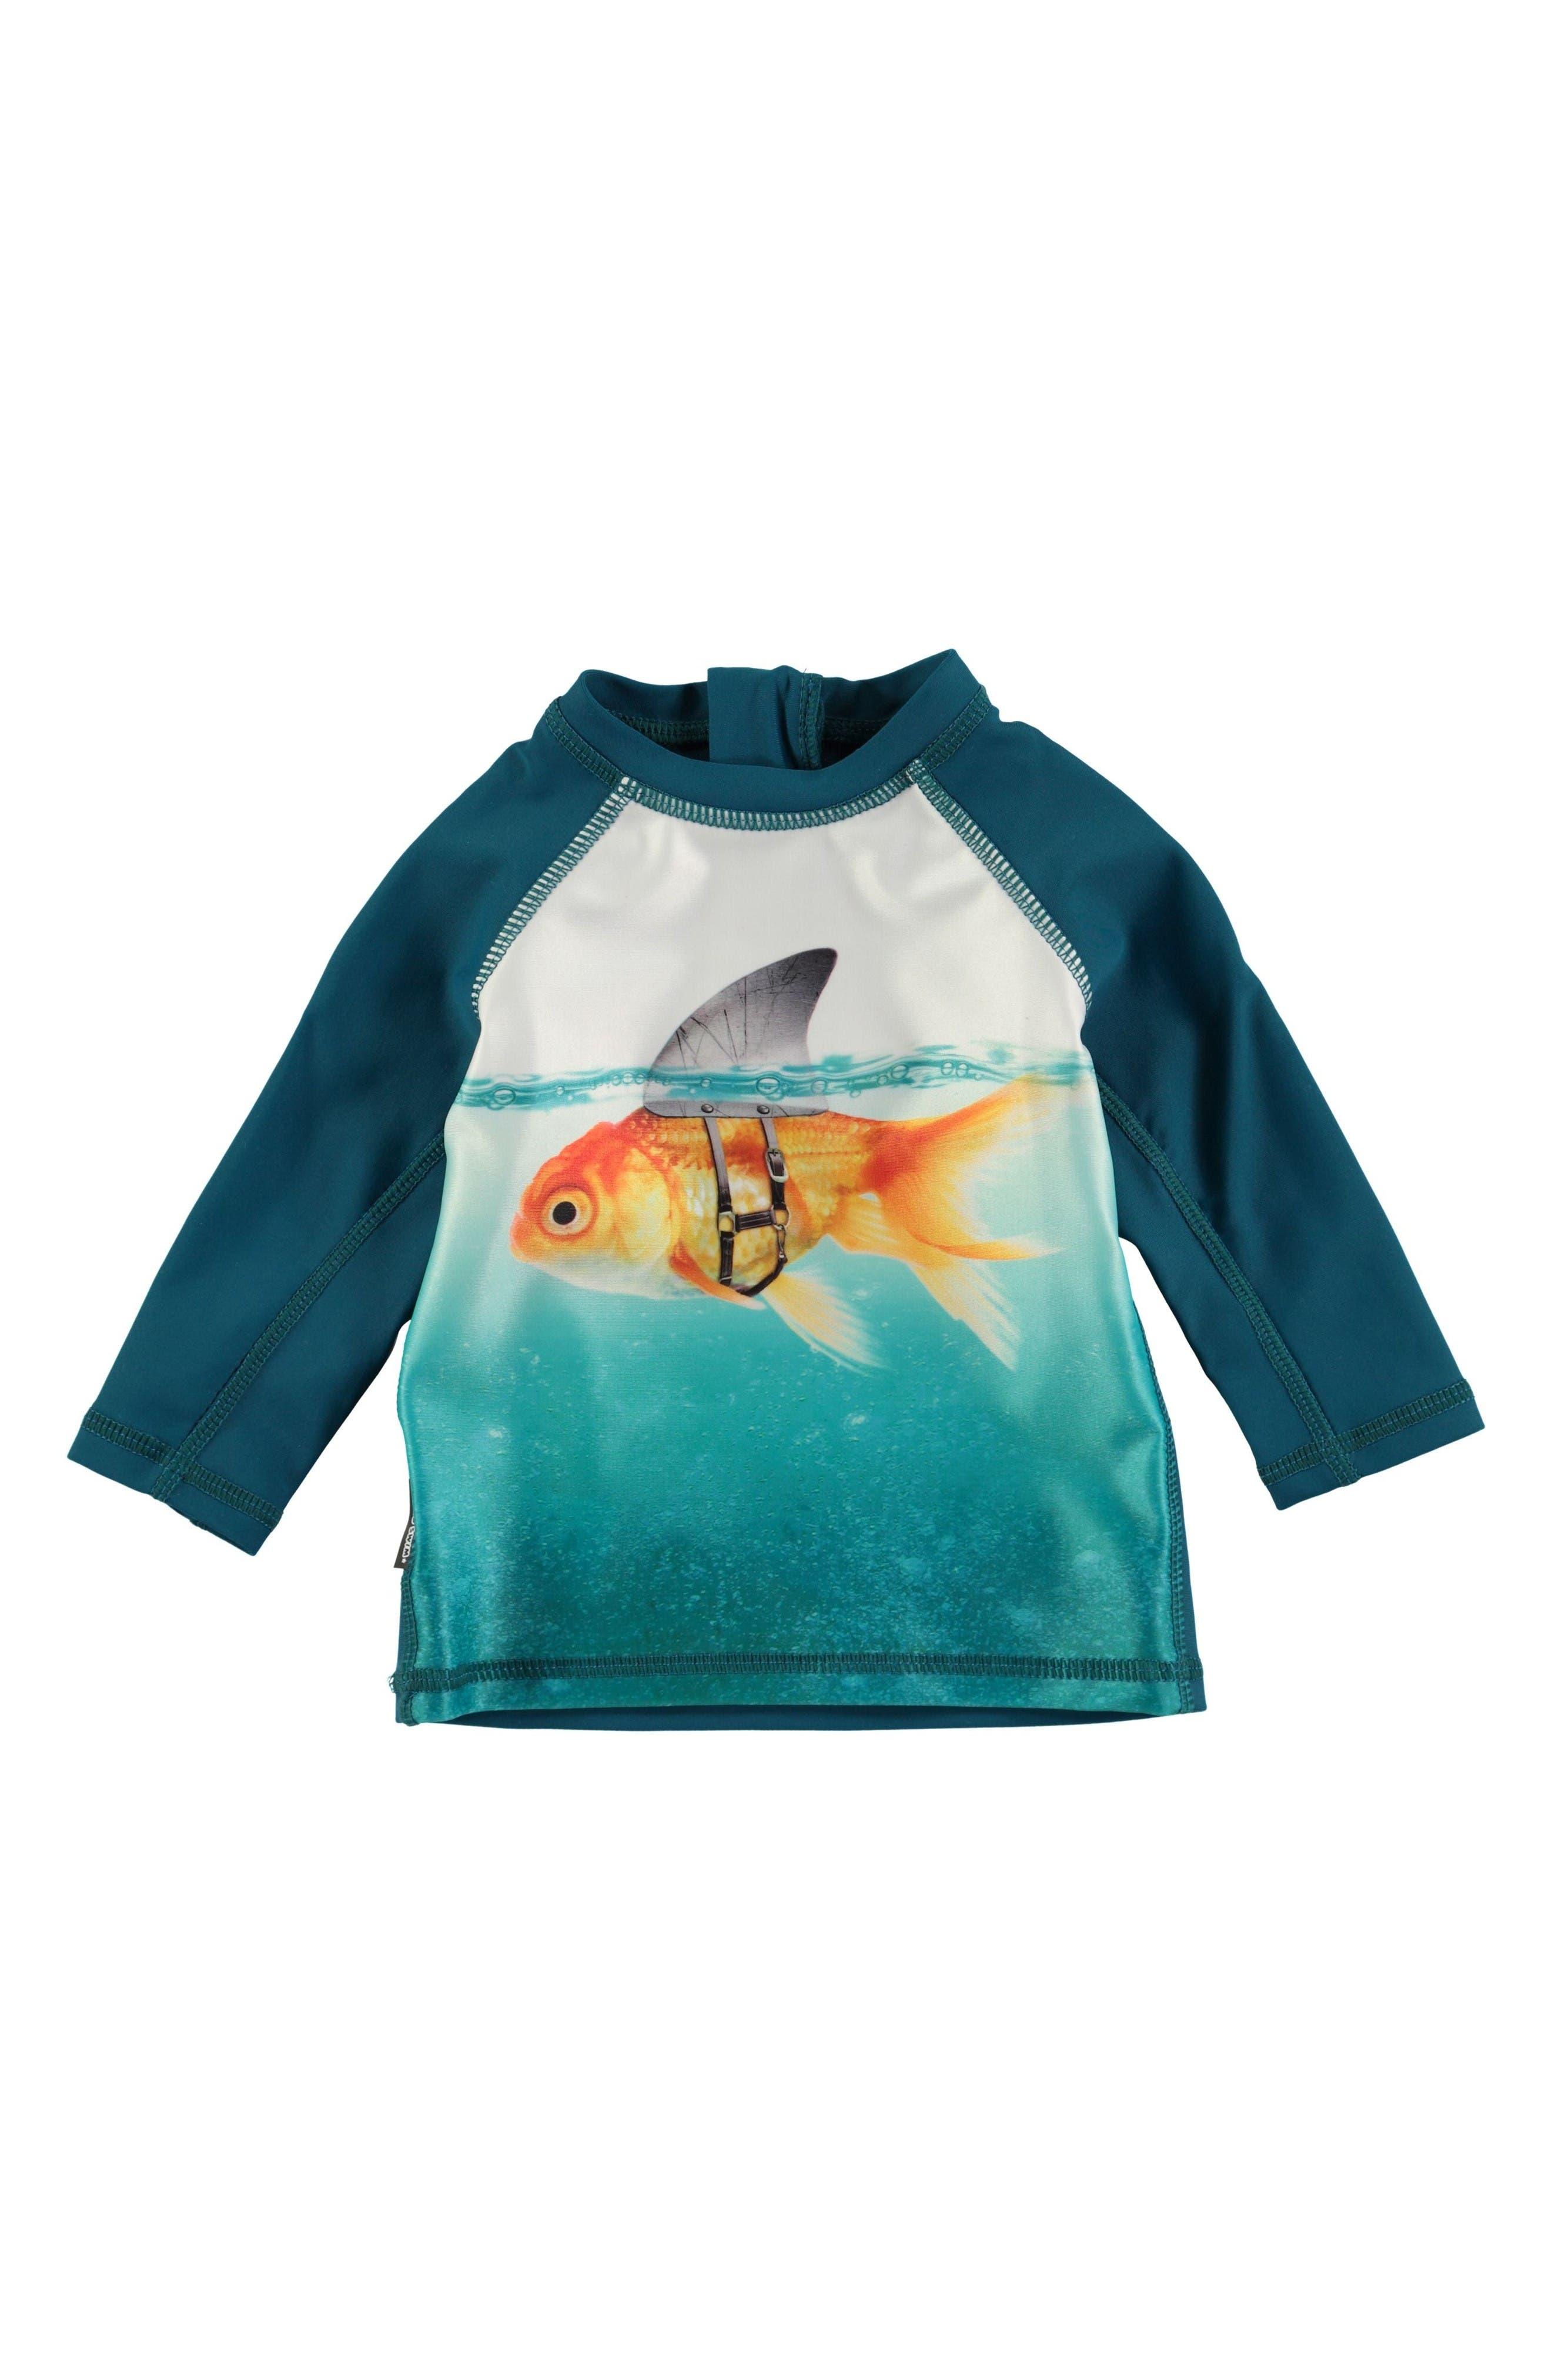 MOLO Nemo Stingray Print Rashguard